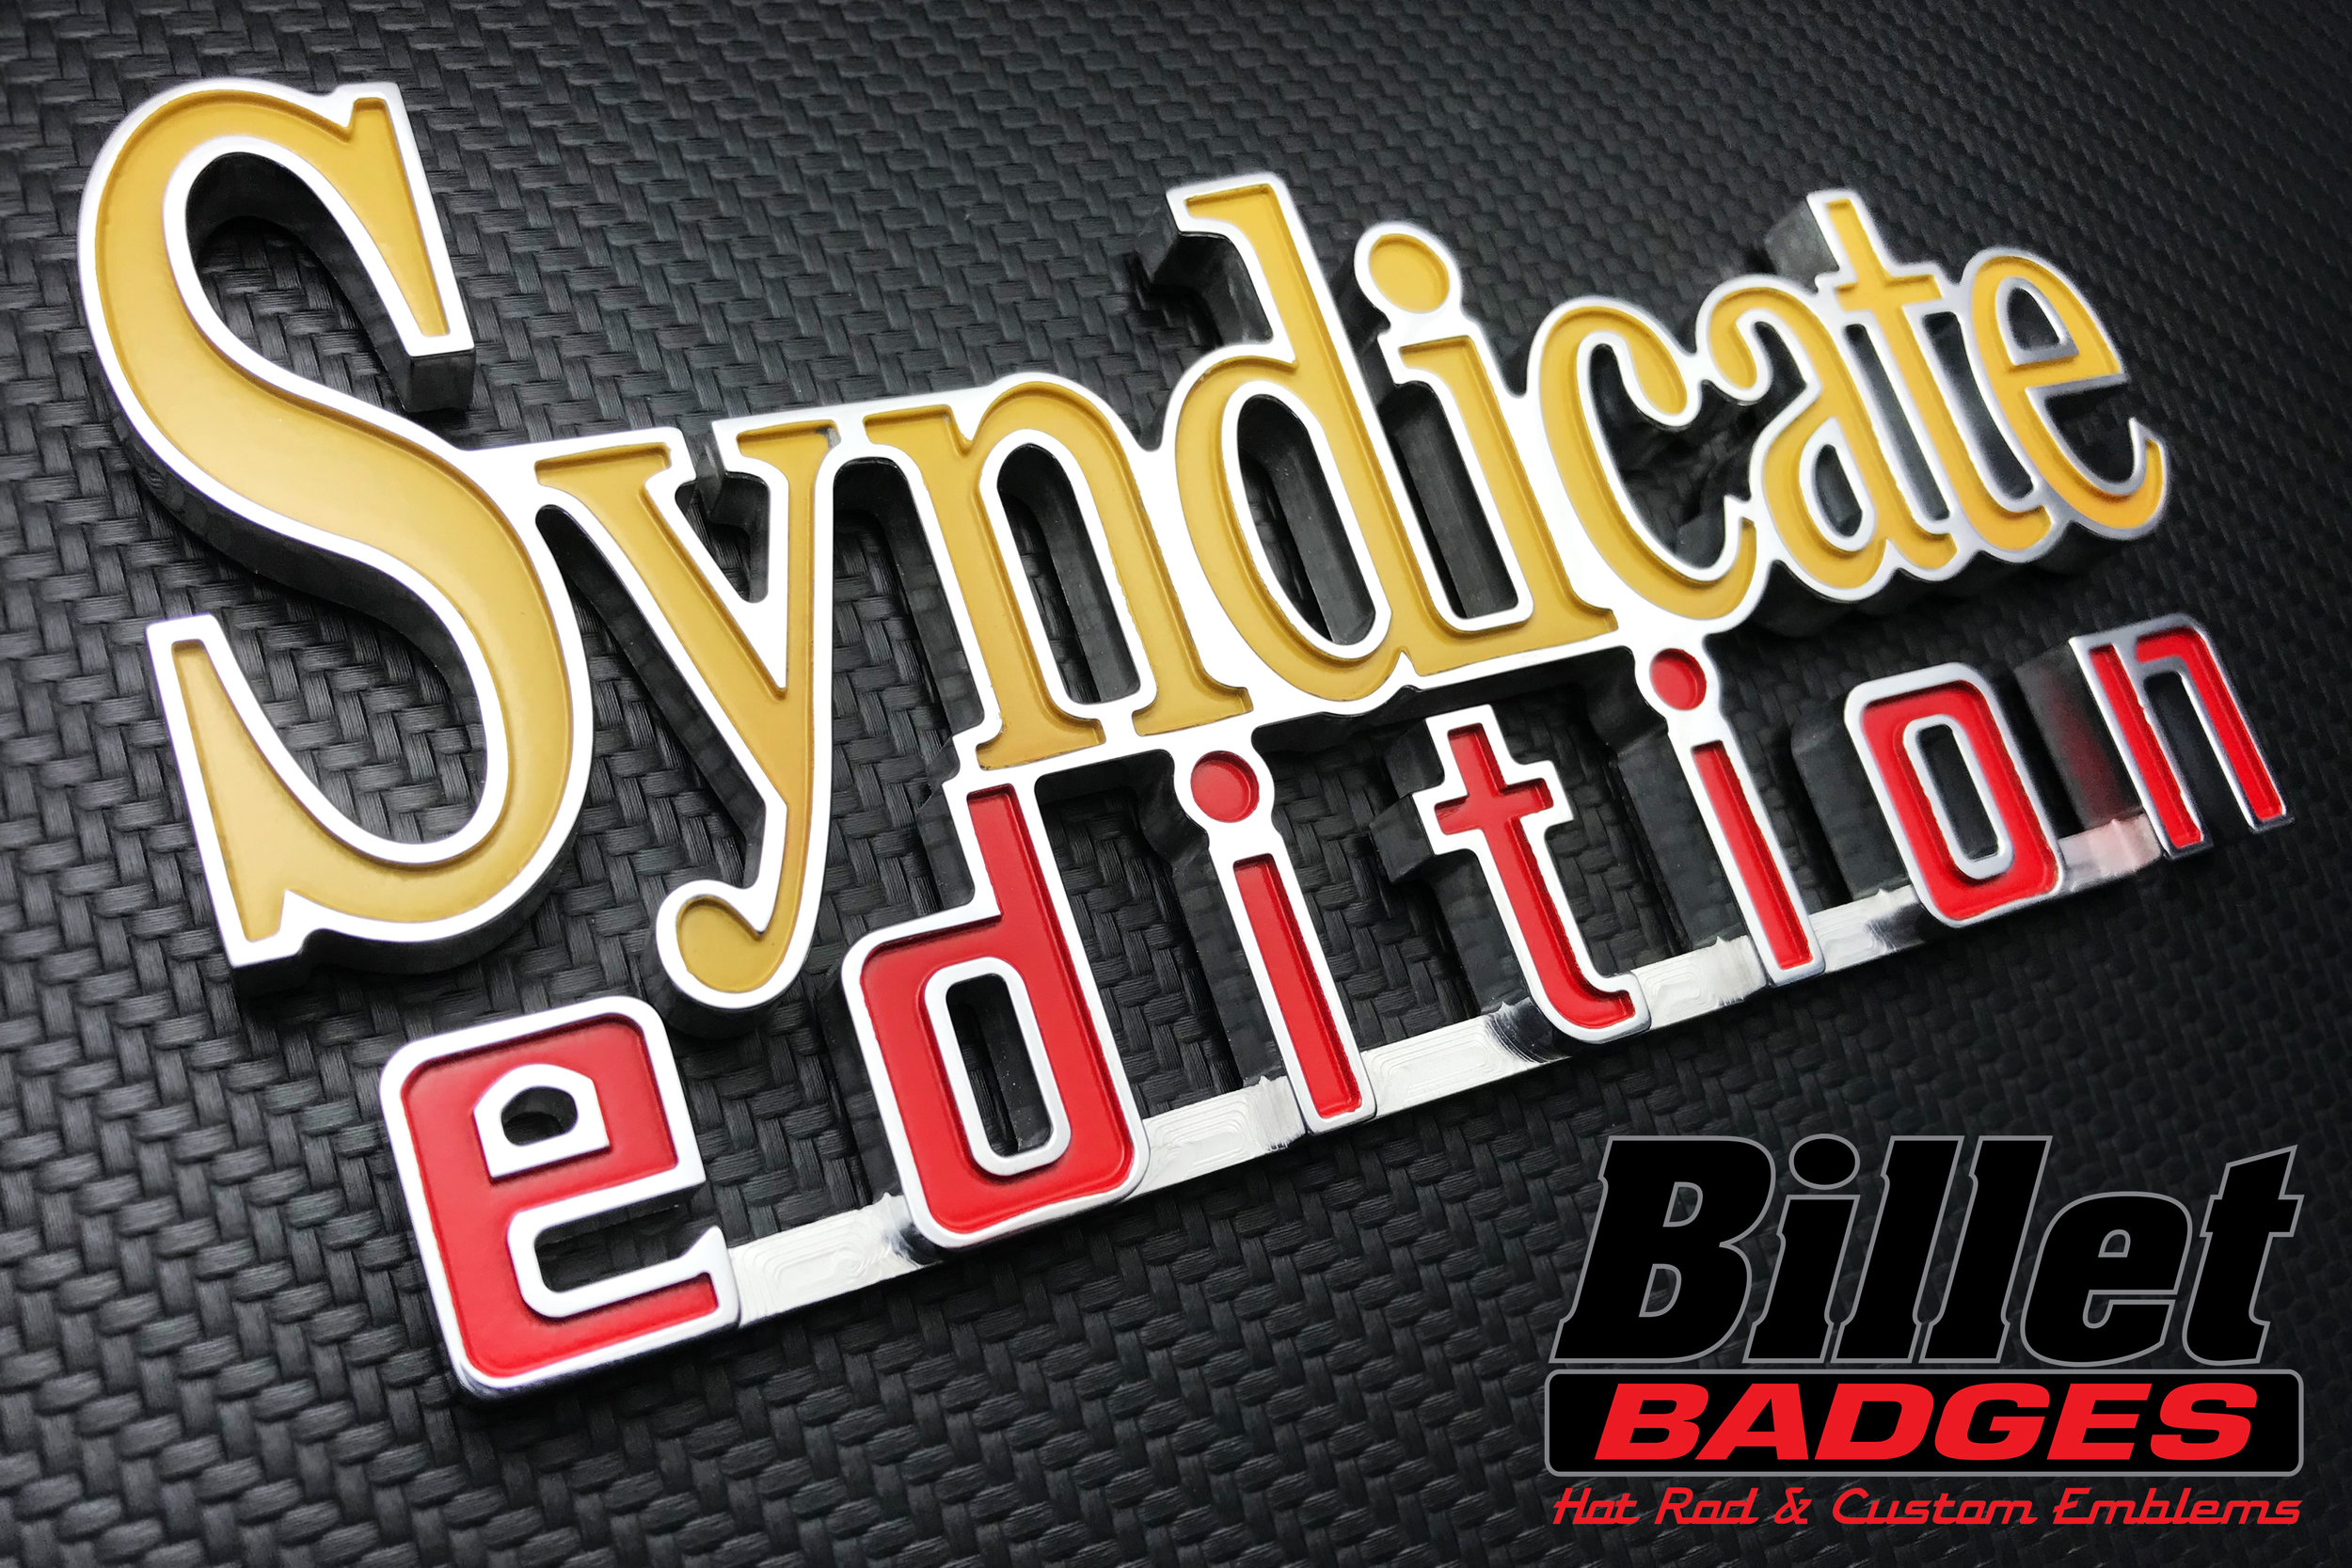 syndicate_edition.jpg